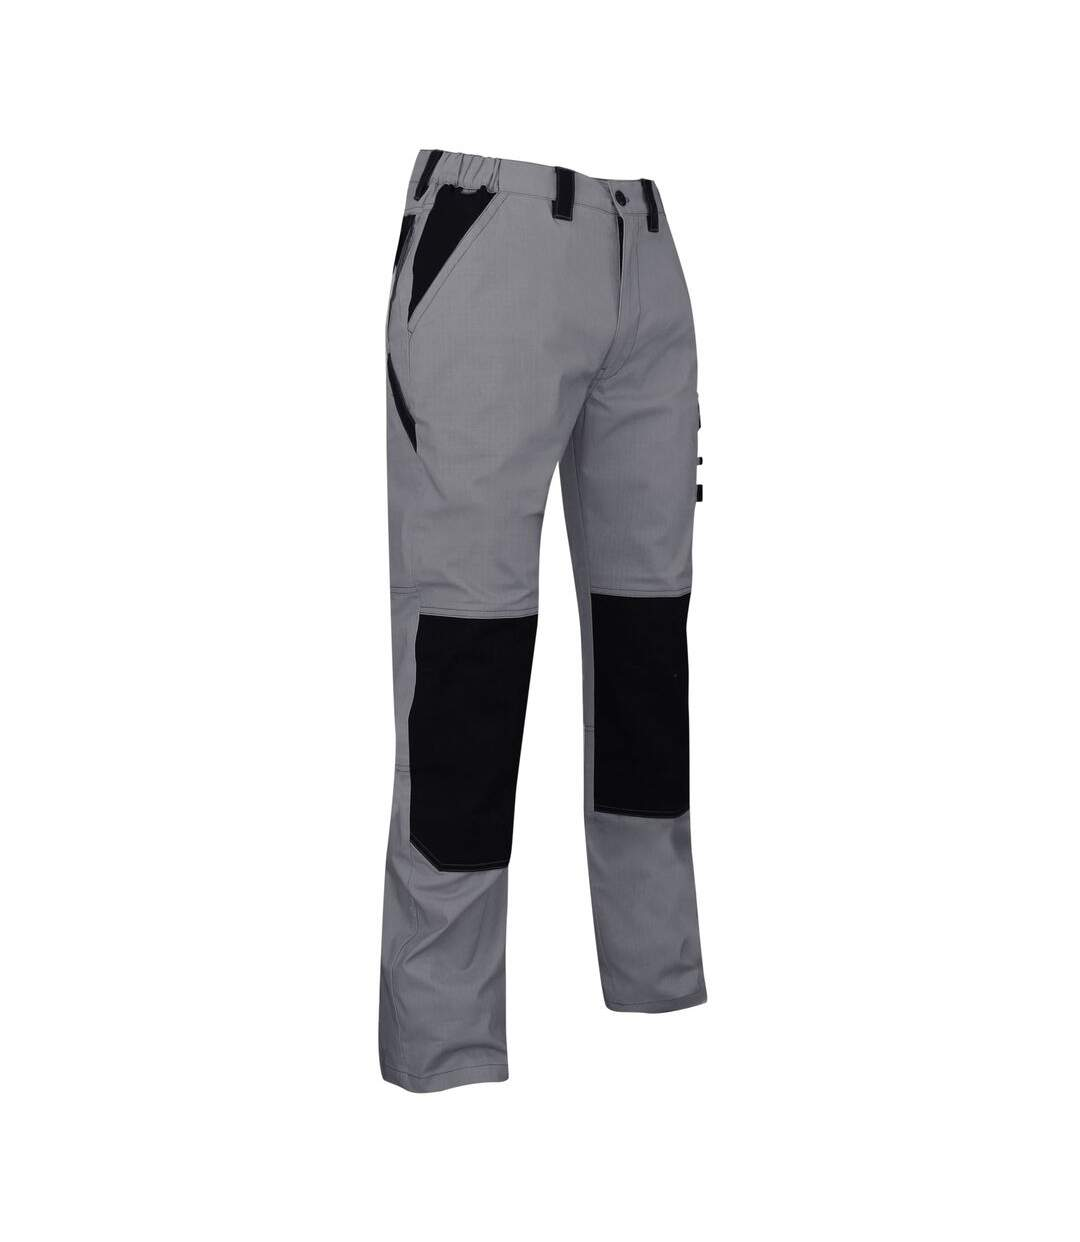 Pantalon  été LMA Pluton Ripstop